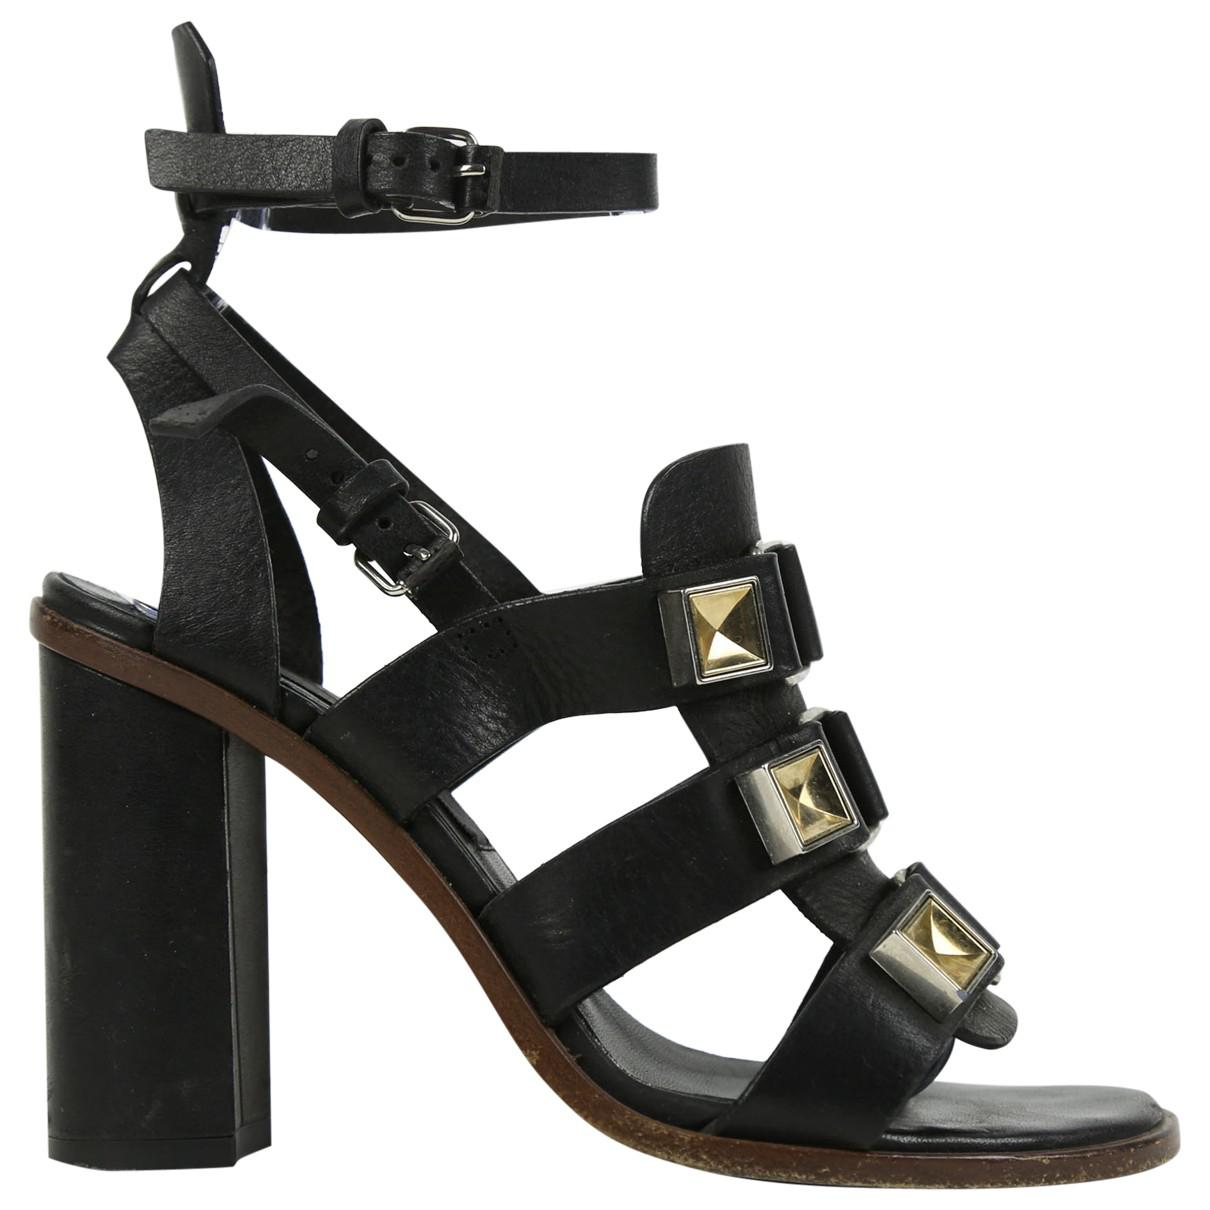 Pre-owned - Leather heels Proenza Schouler xaYAcf8J4